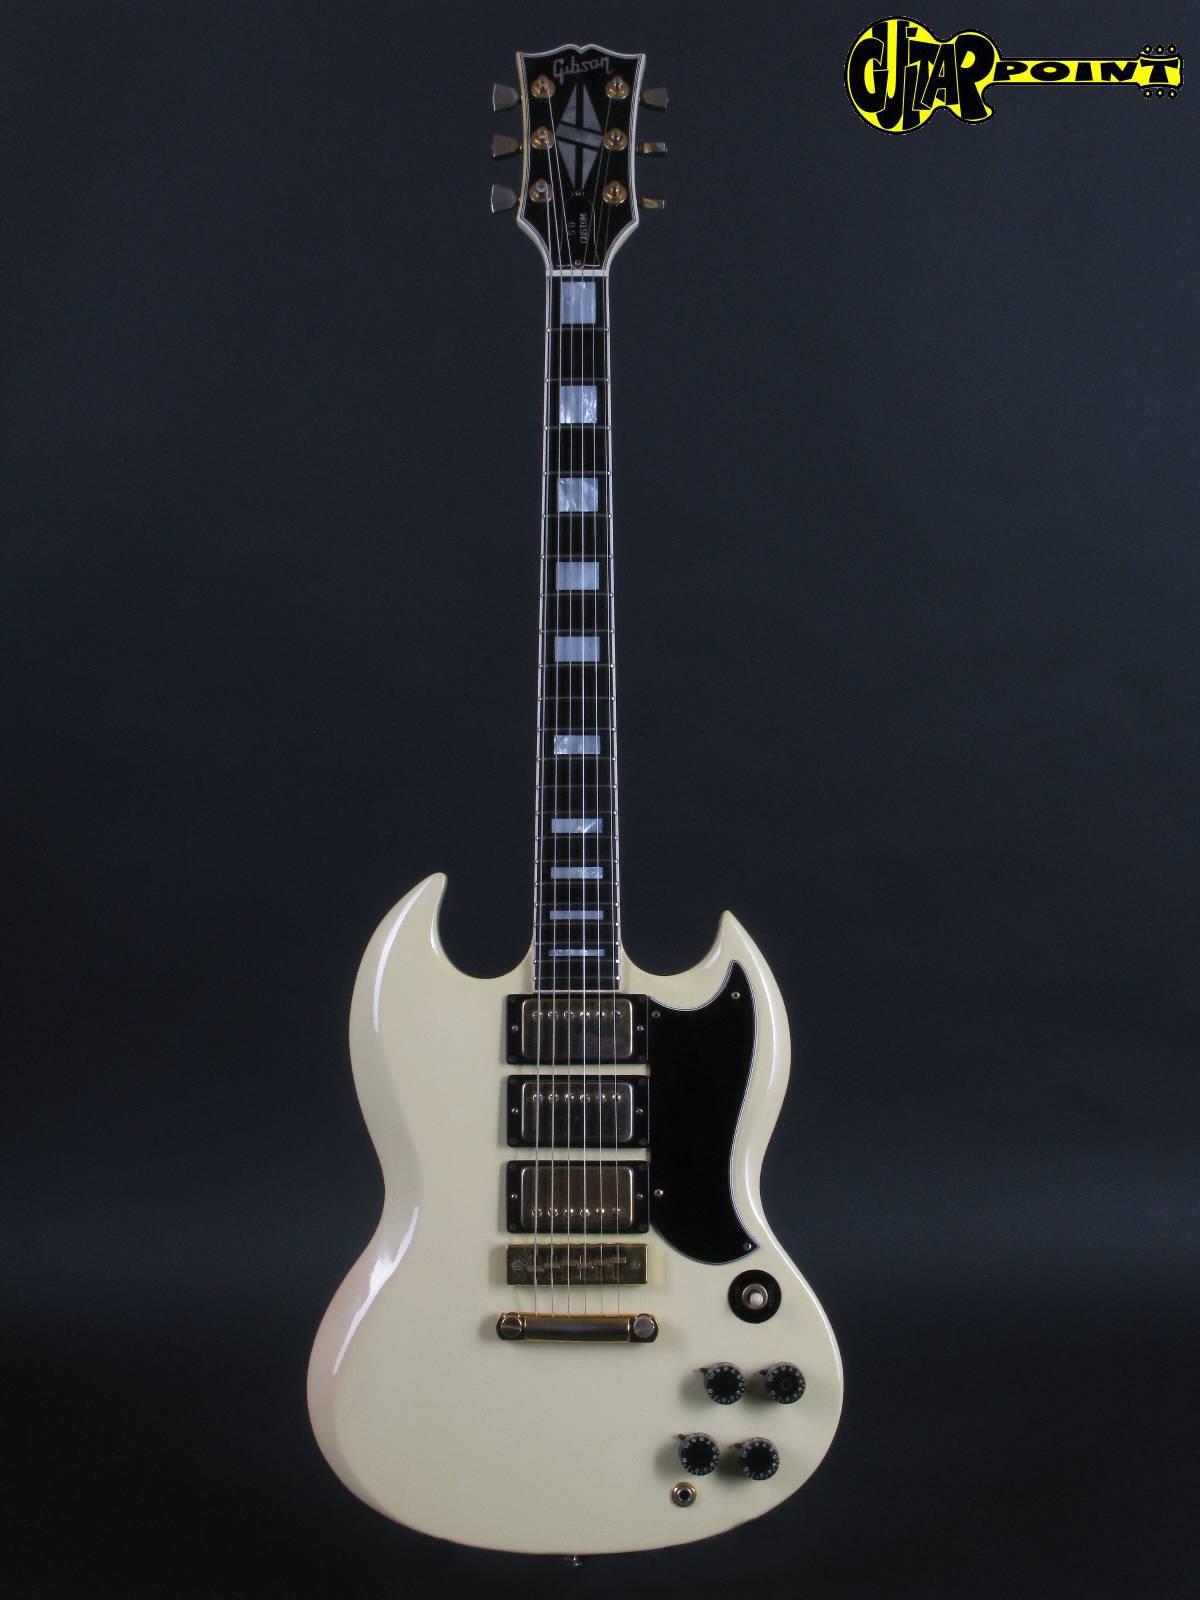 Rare Electric Guitars >> Gibson SG Custom 1974 White Guitar For Sale GuitarPoint